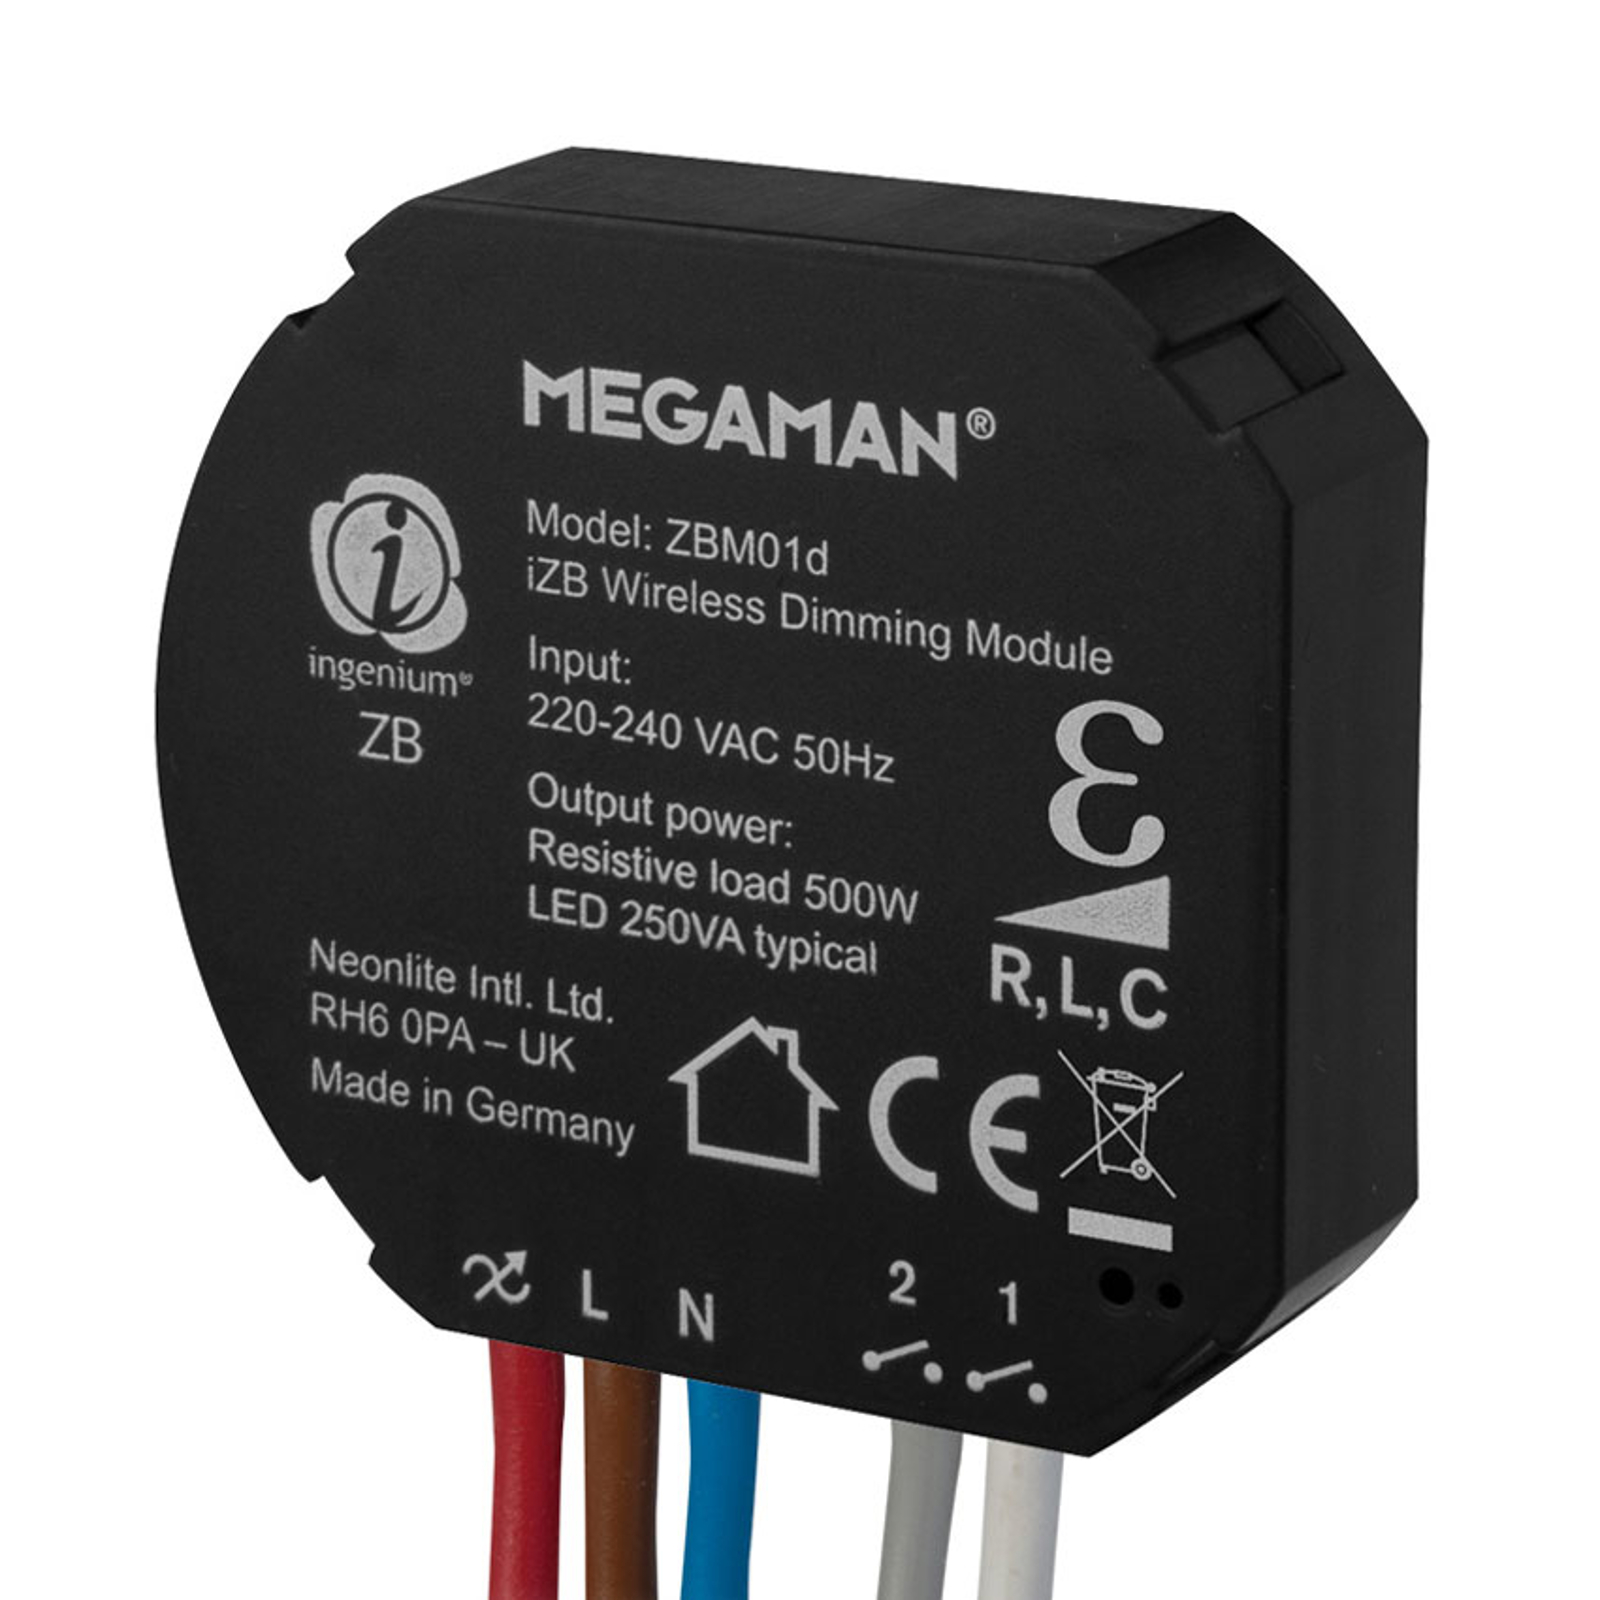 Megaman ingenium®ZB module variateur 250W, R L C